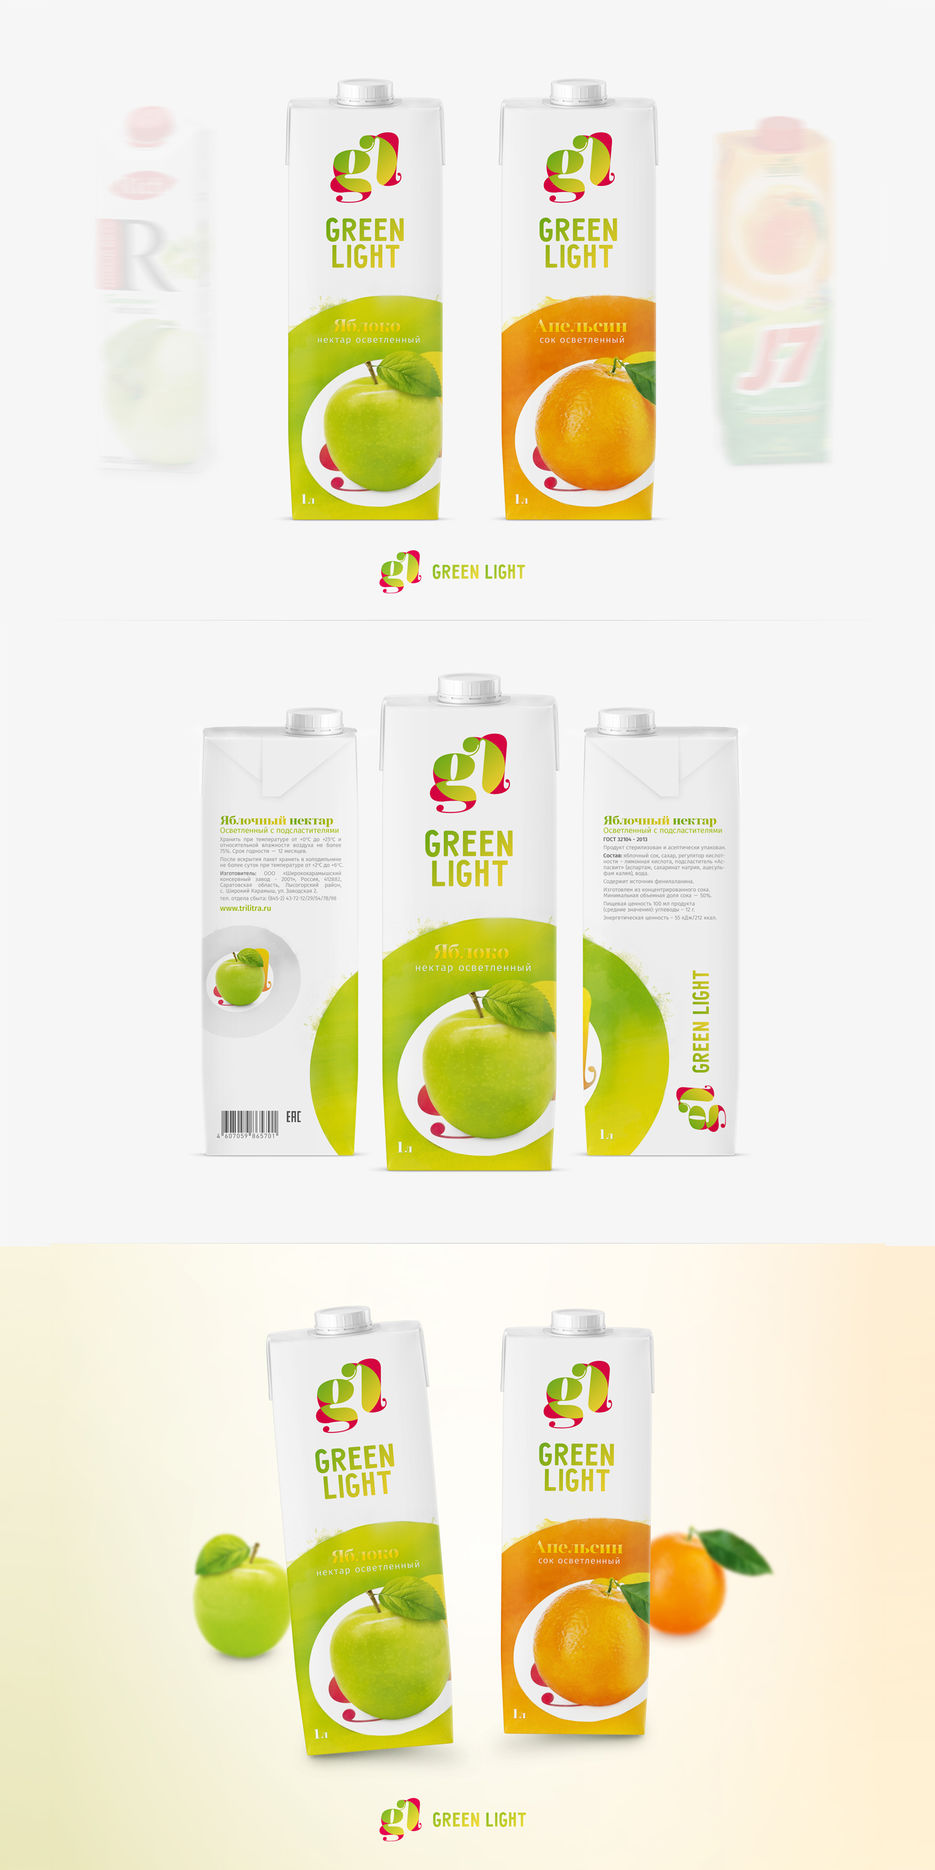 Дизайн логотипа и упаковки тетрапак